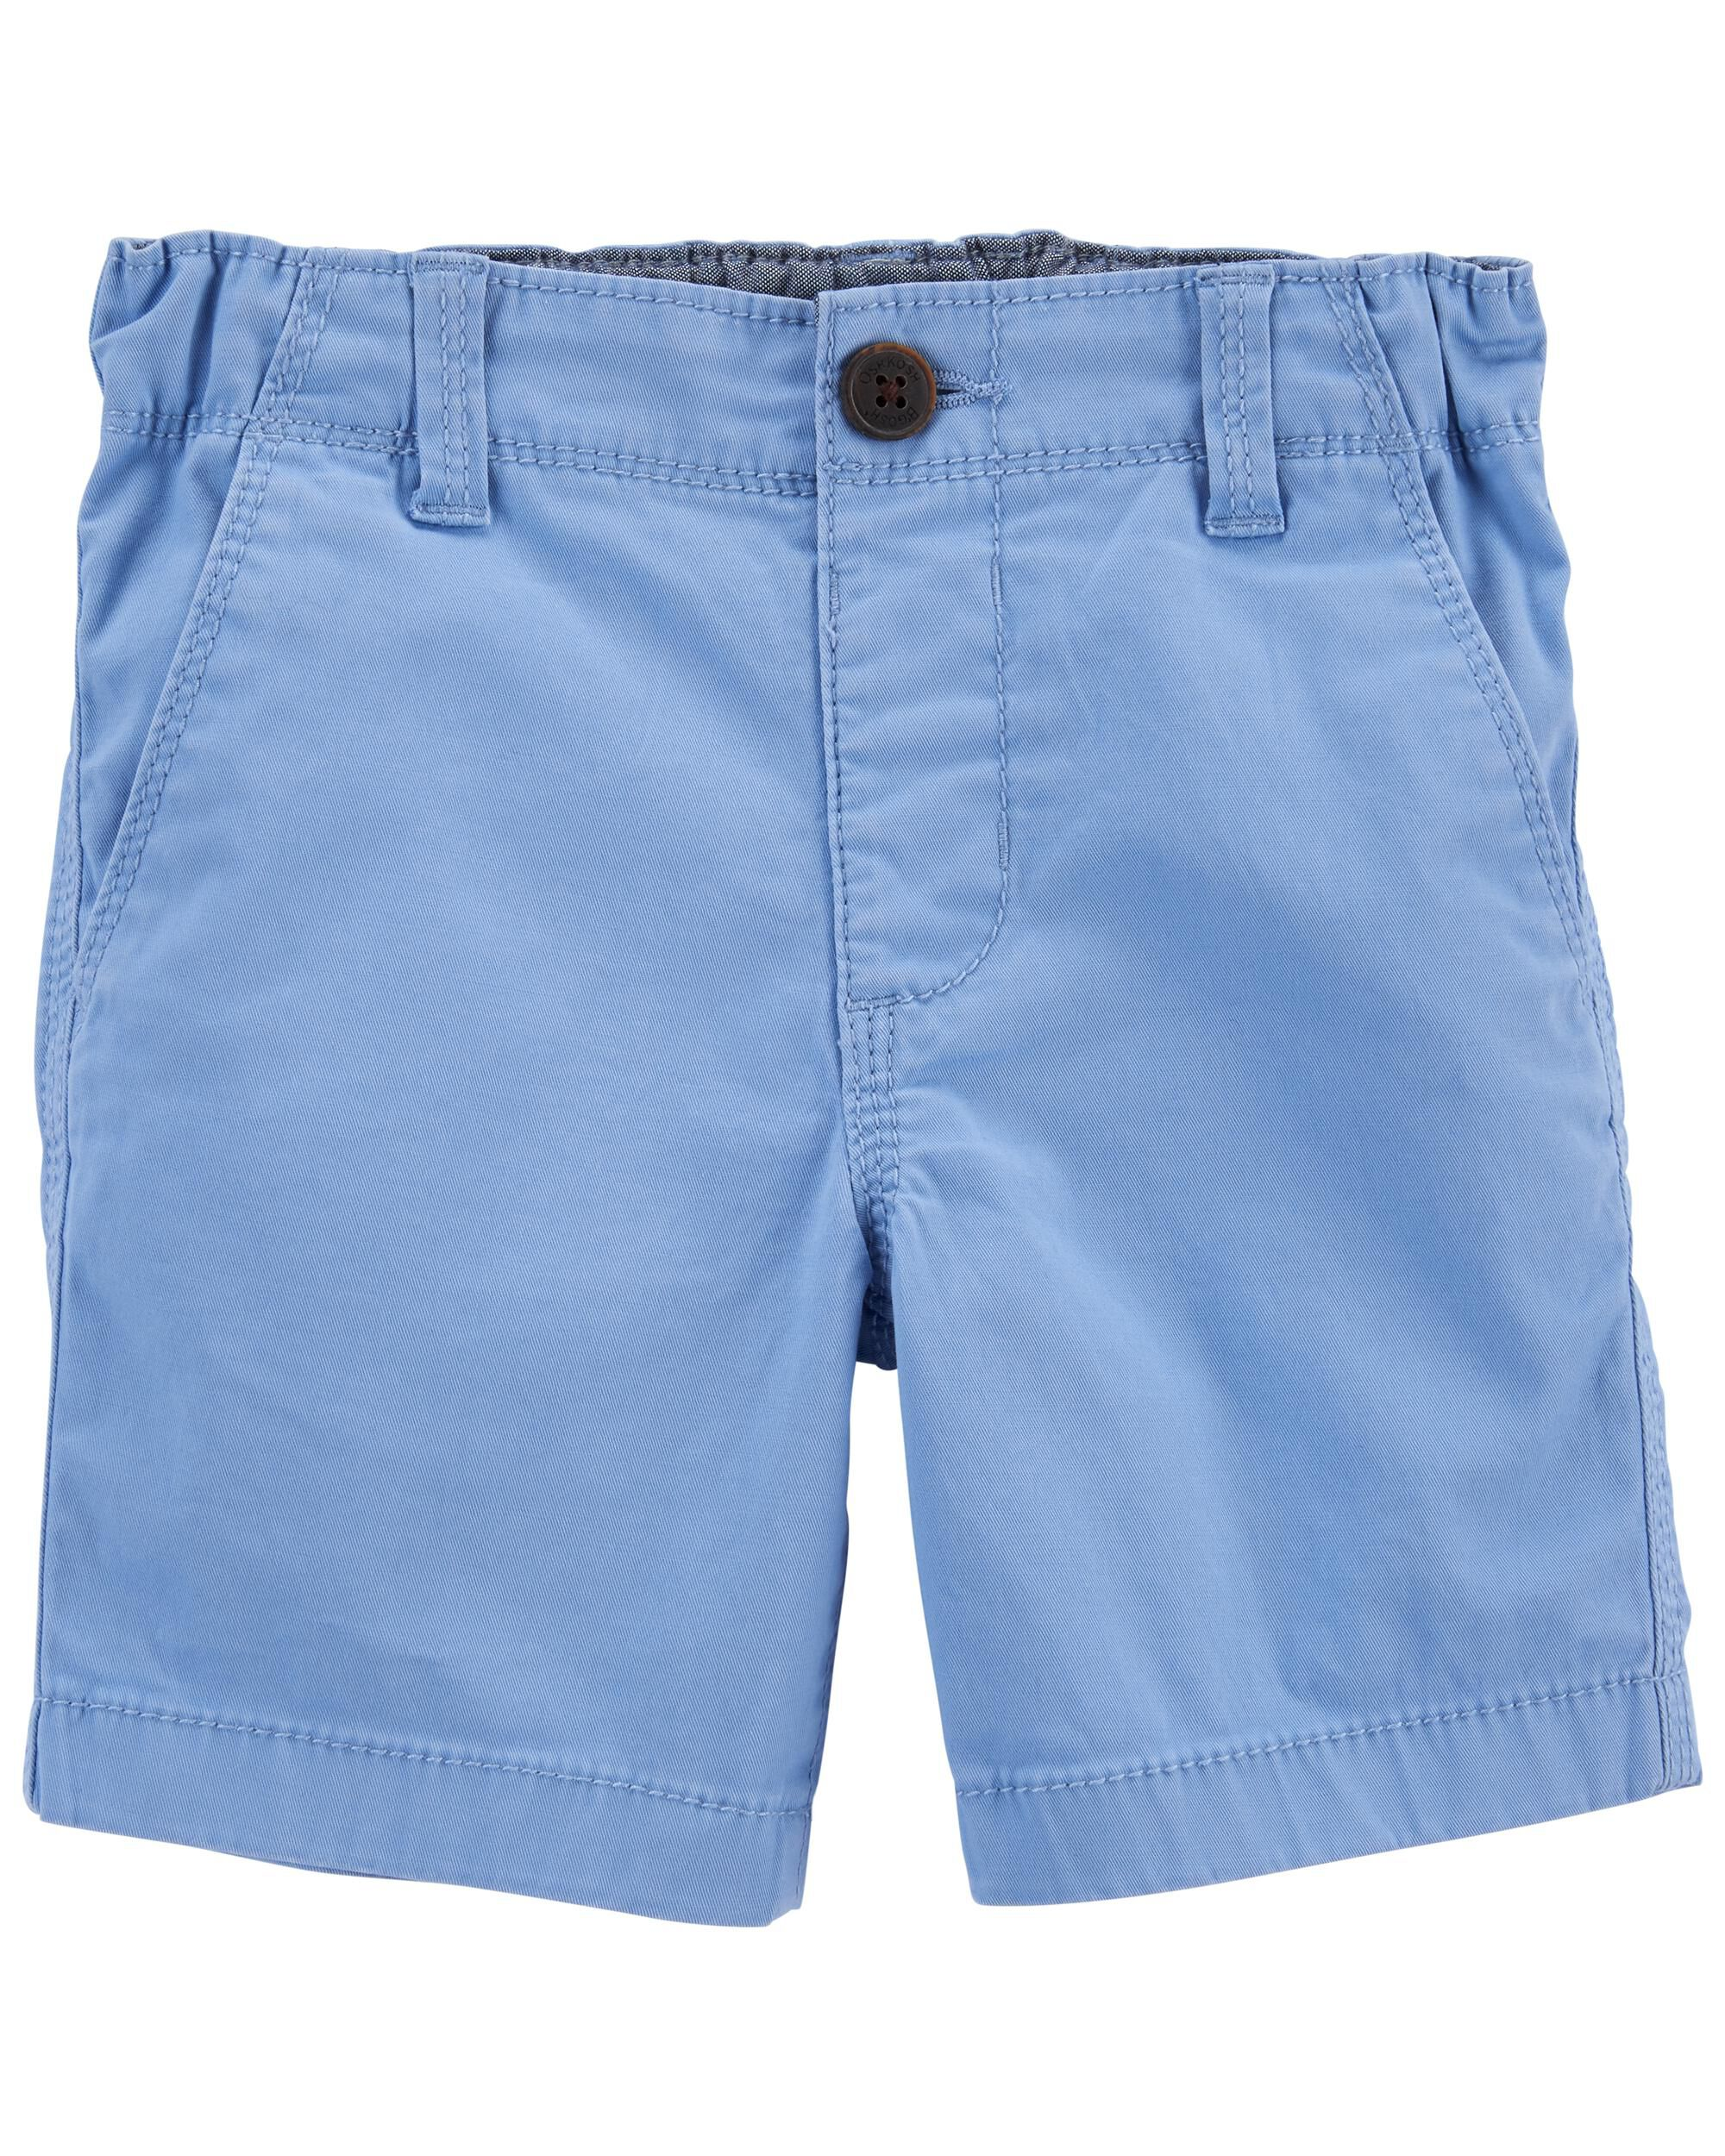 *DOORBUSTER* Stretch Chino Shorts